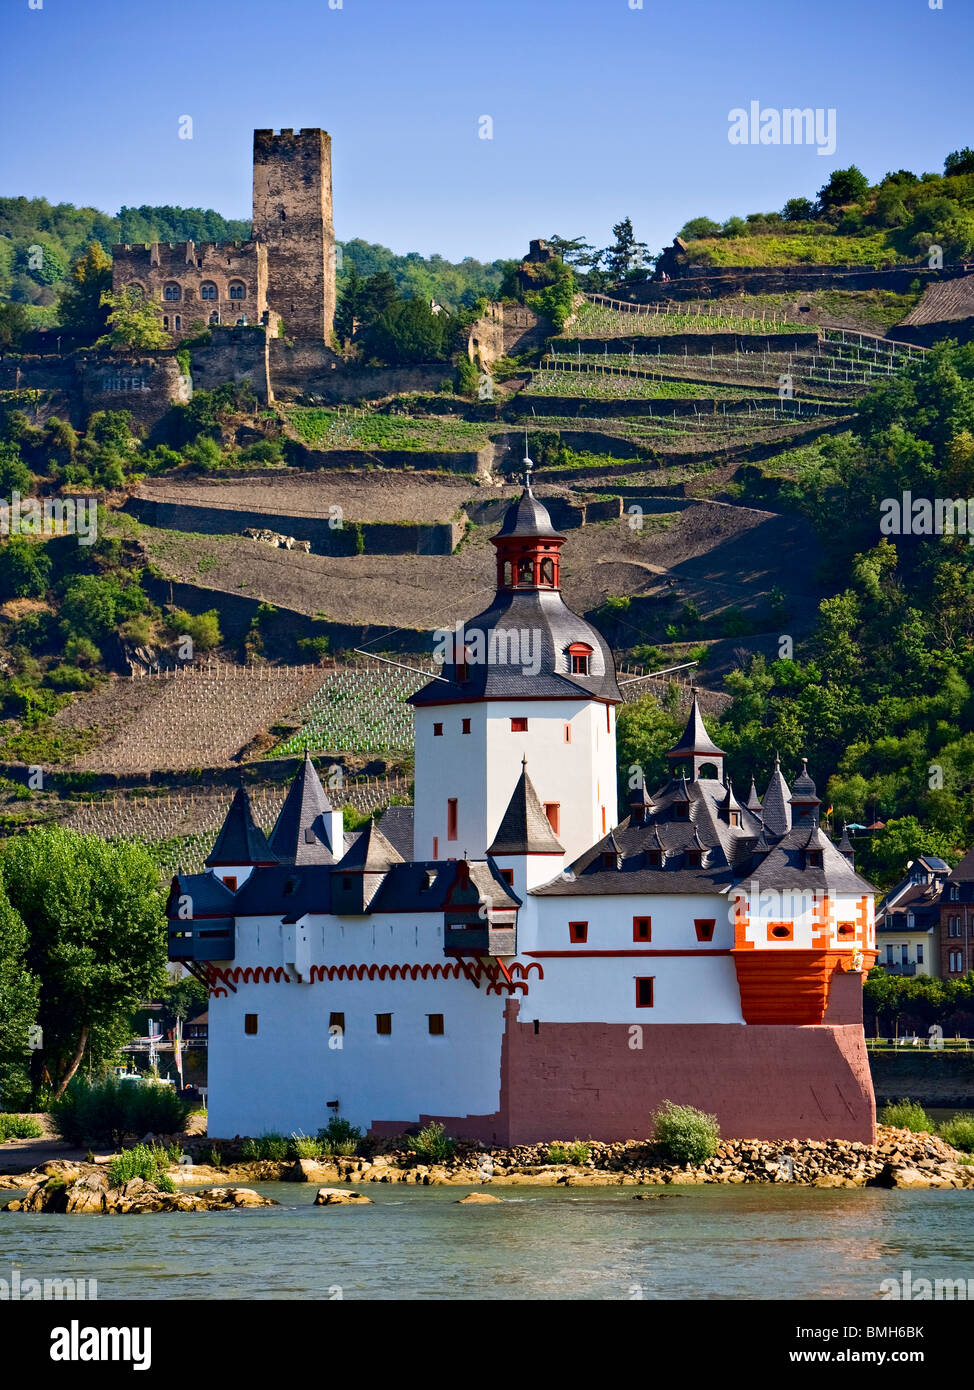 Kaub Castle on the Rein River, Rhein, Rhine, Germany, Europe - Stock Image